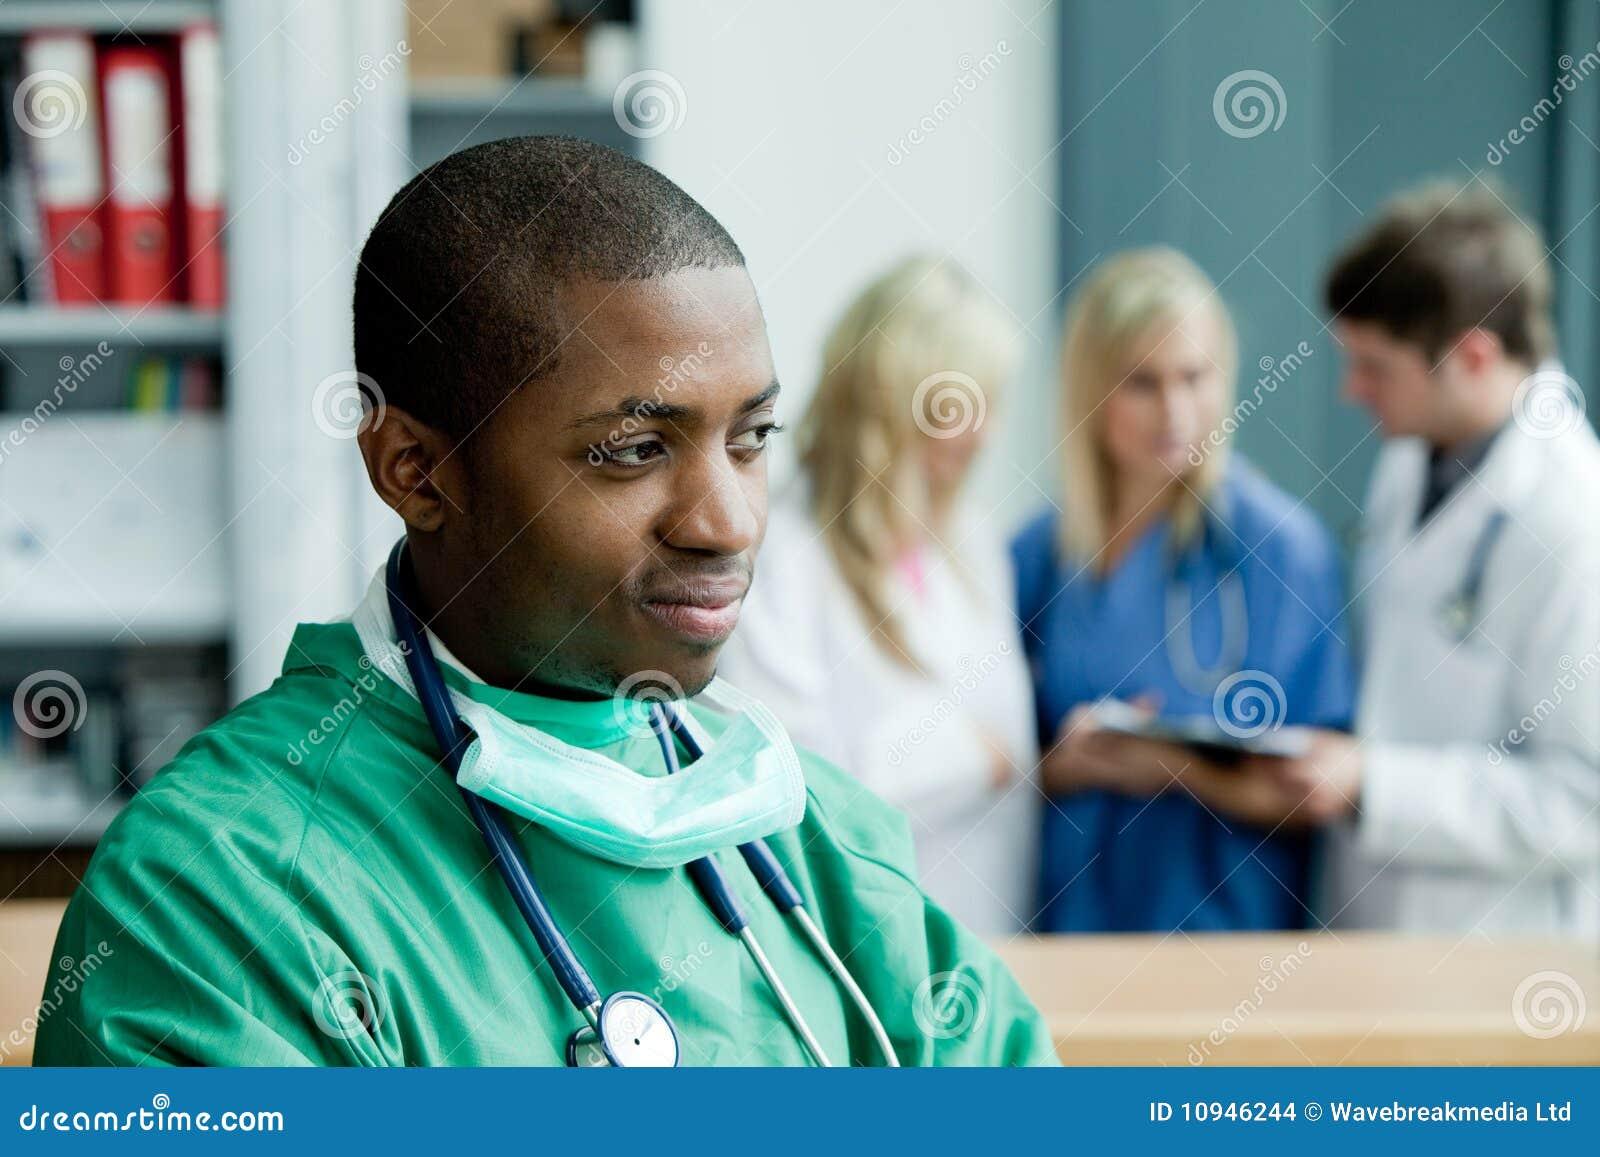 Hospital surgeon thinking